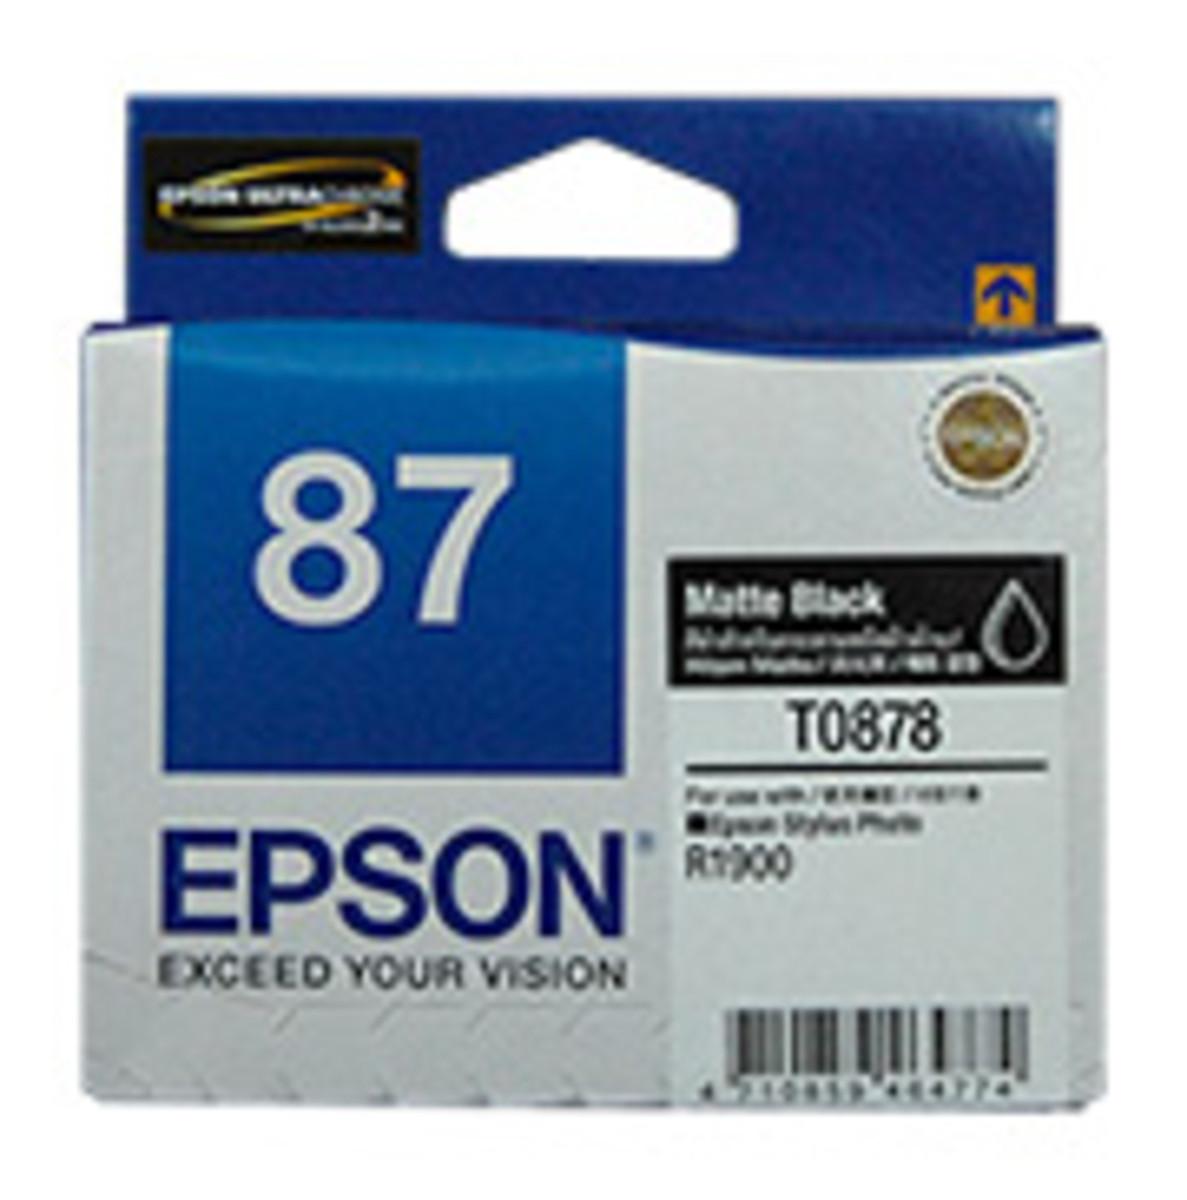 Epson 87 Matte Black Ink Cartridge